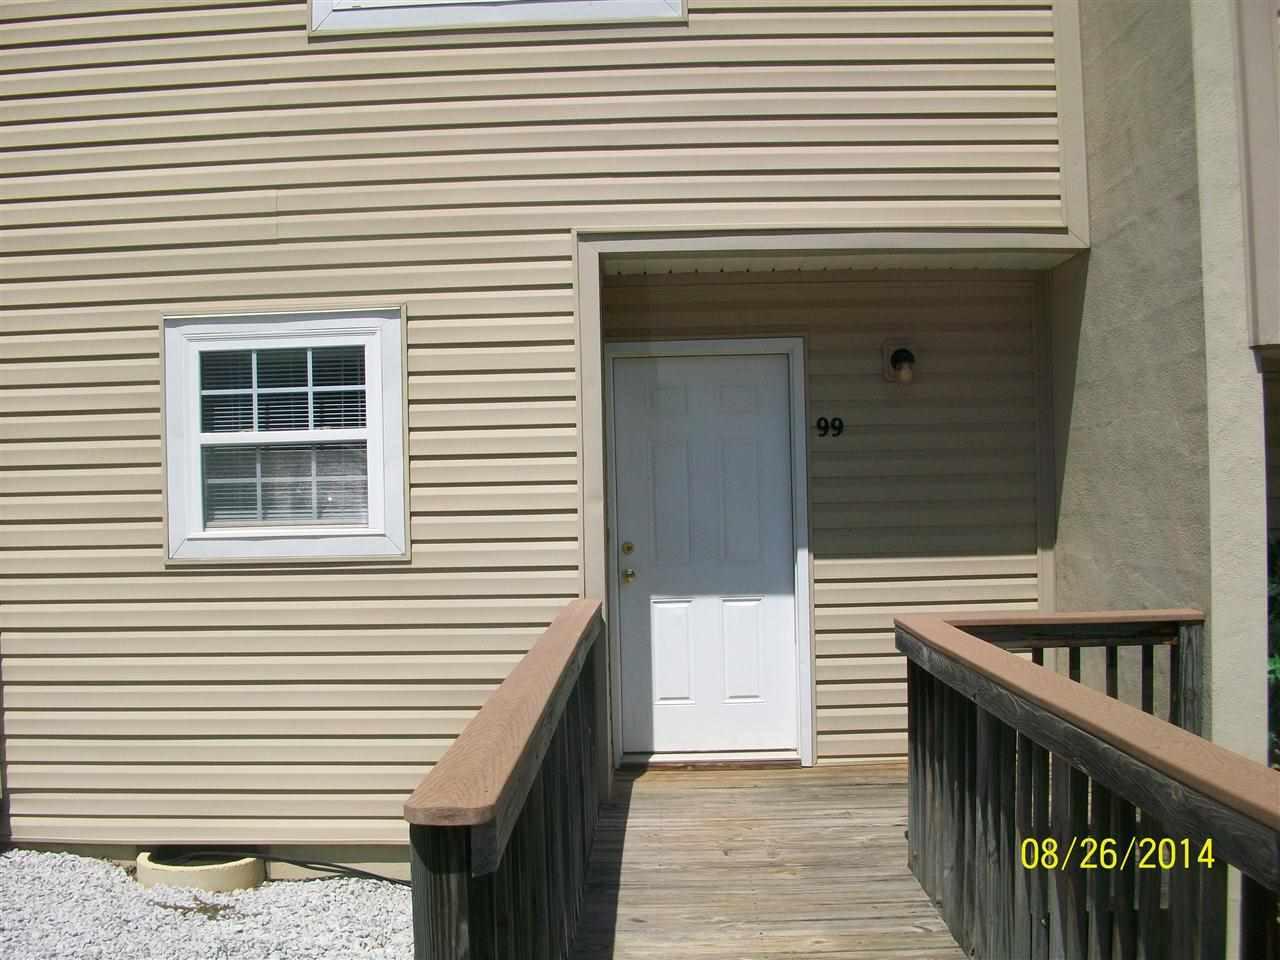 Rental Homes for Rent, ListingId:29850725, location: 299 Brookwood Dr.#99 Seneca 29678